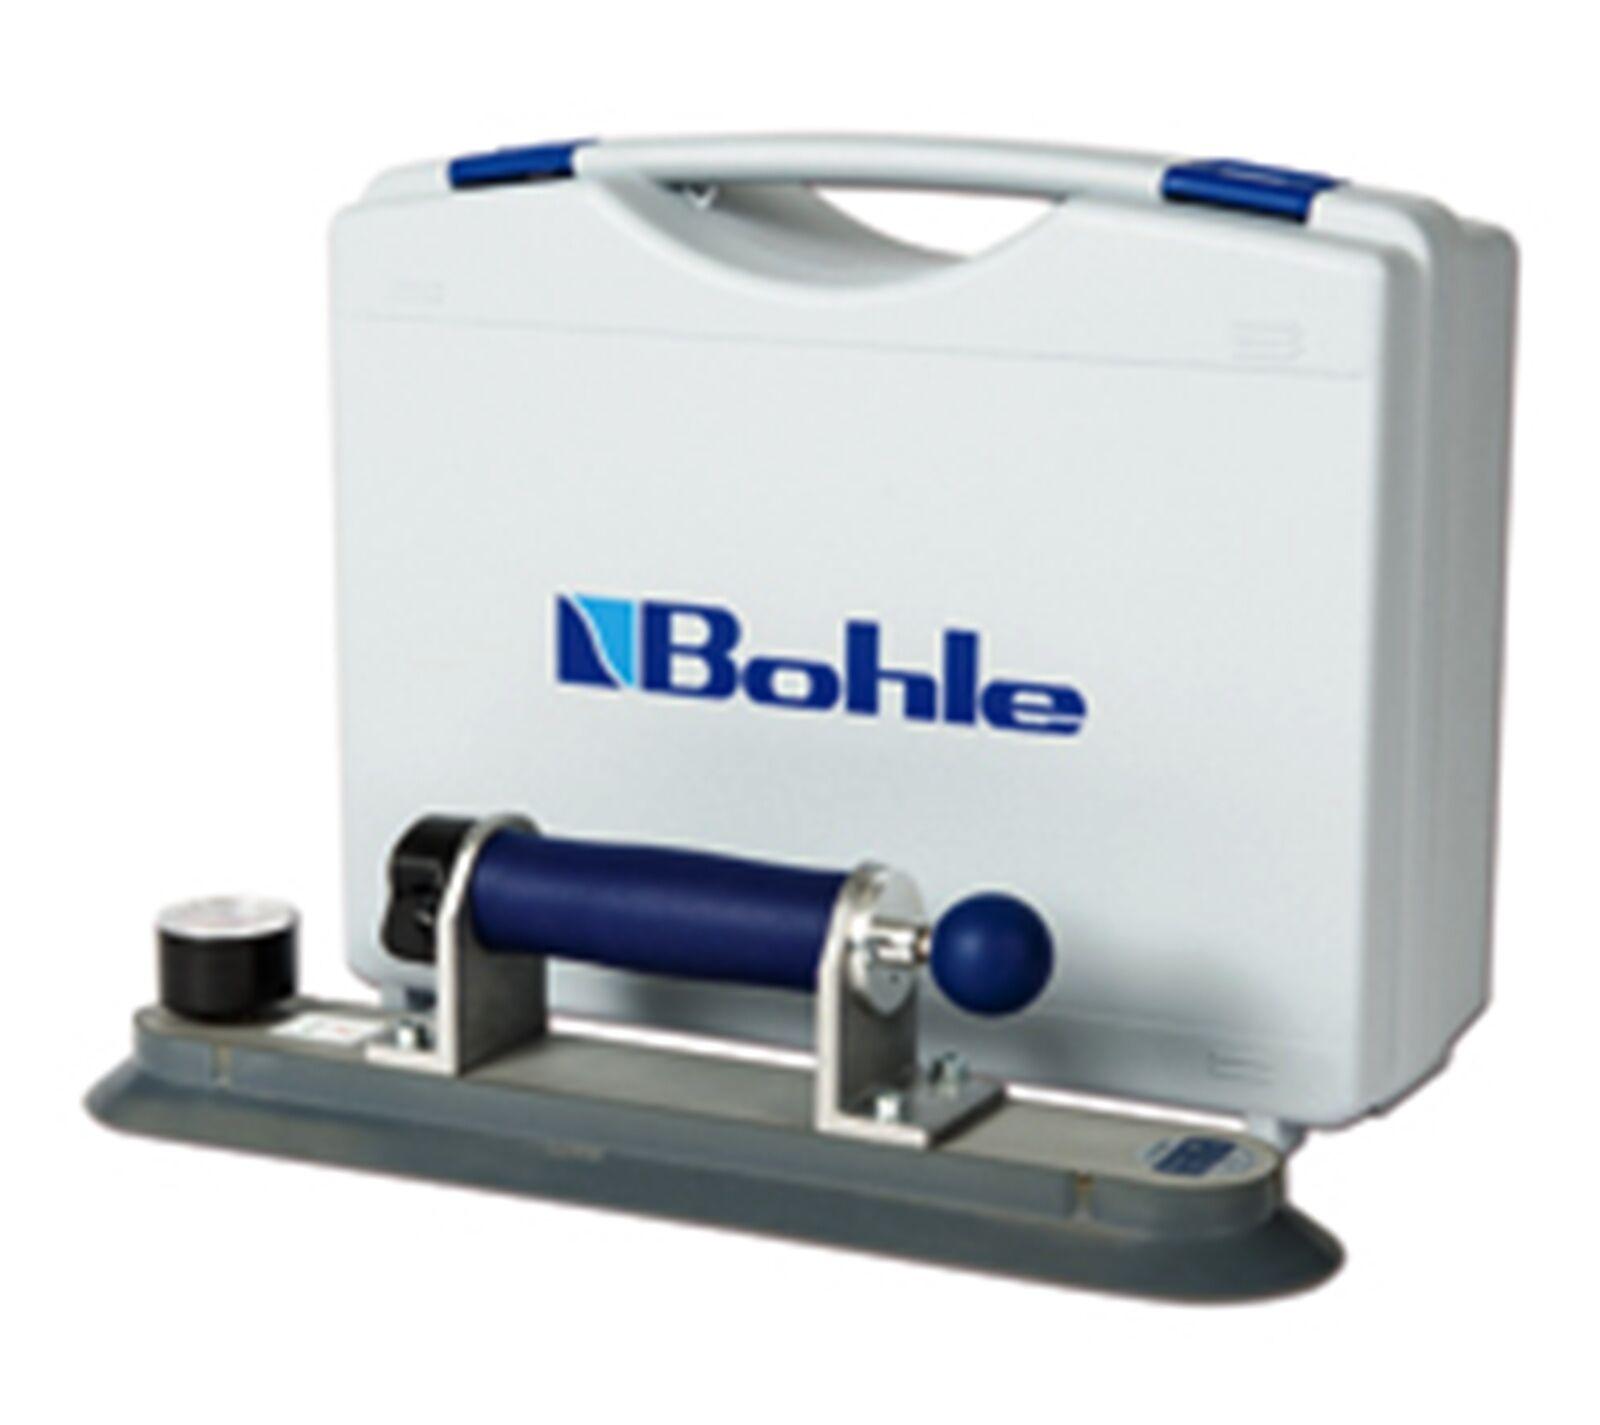 Veribor® Pumpensaugheber aus Aluminium mit Zugpumpe, im im im Koffer,  Sauger, 3d6af7